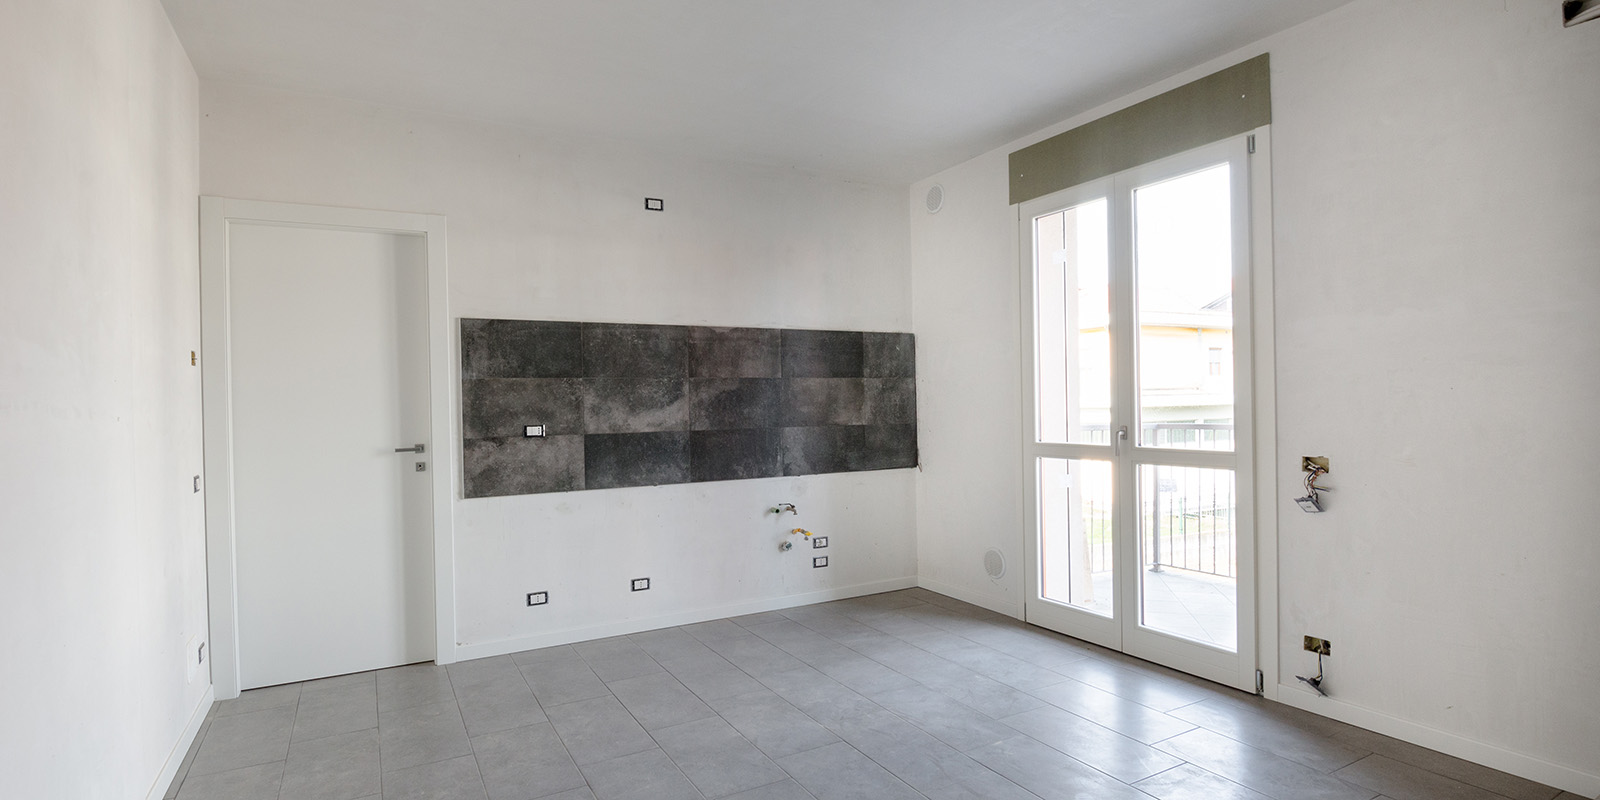 Epis_Bagnatica_Residenza_del_Sole_4